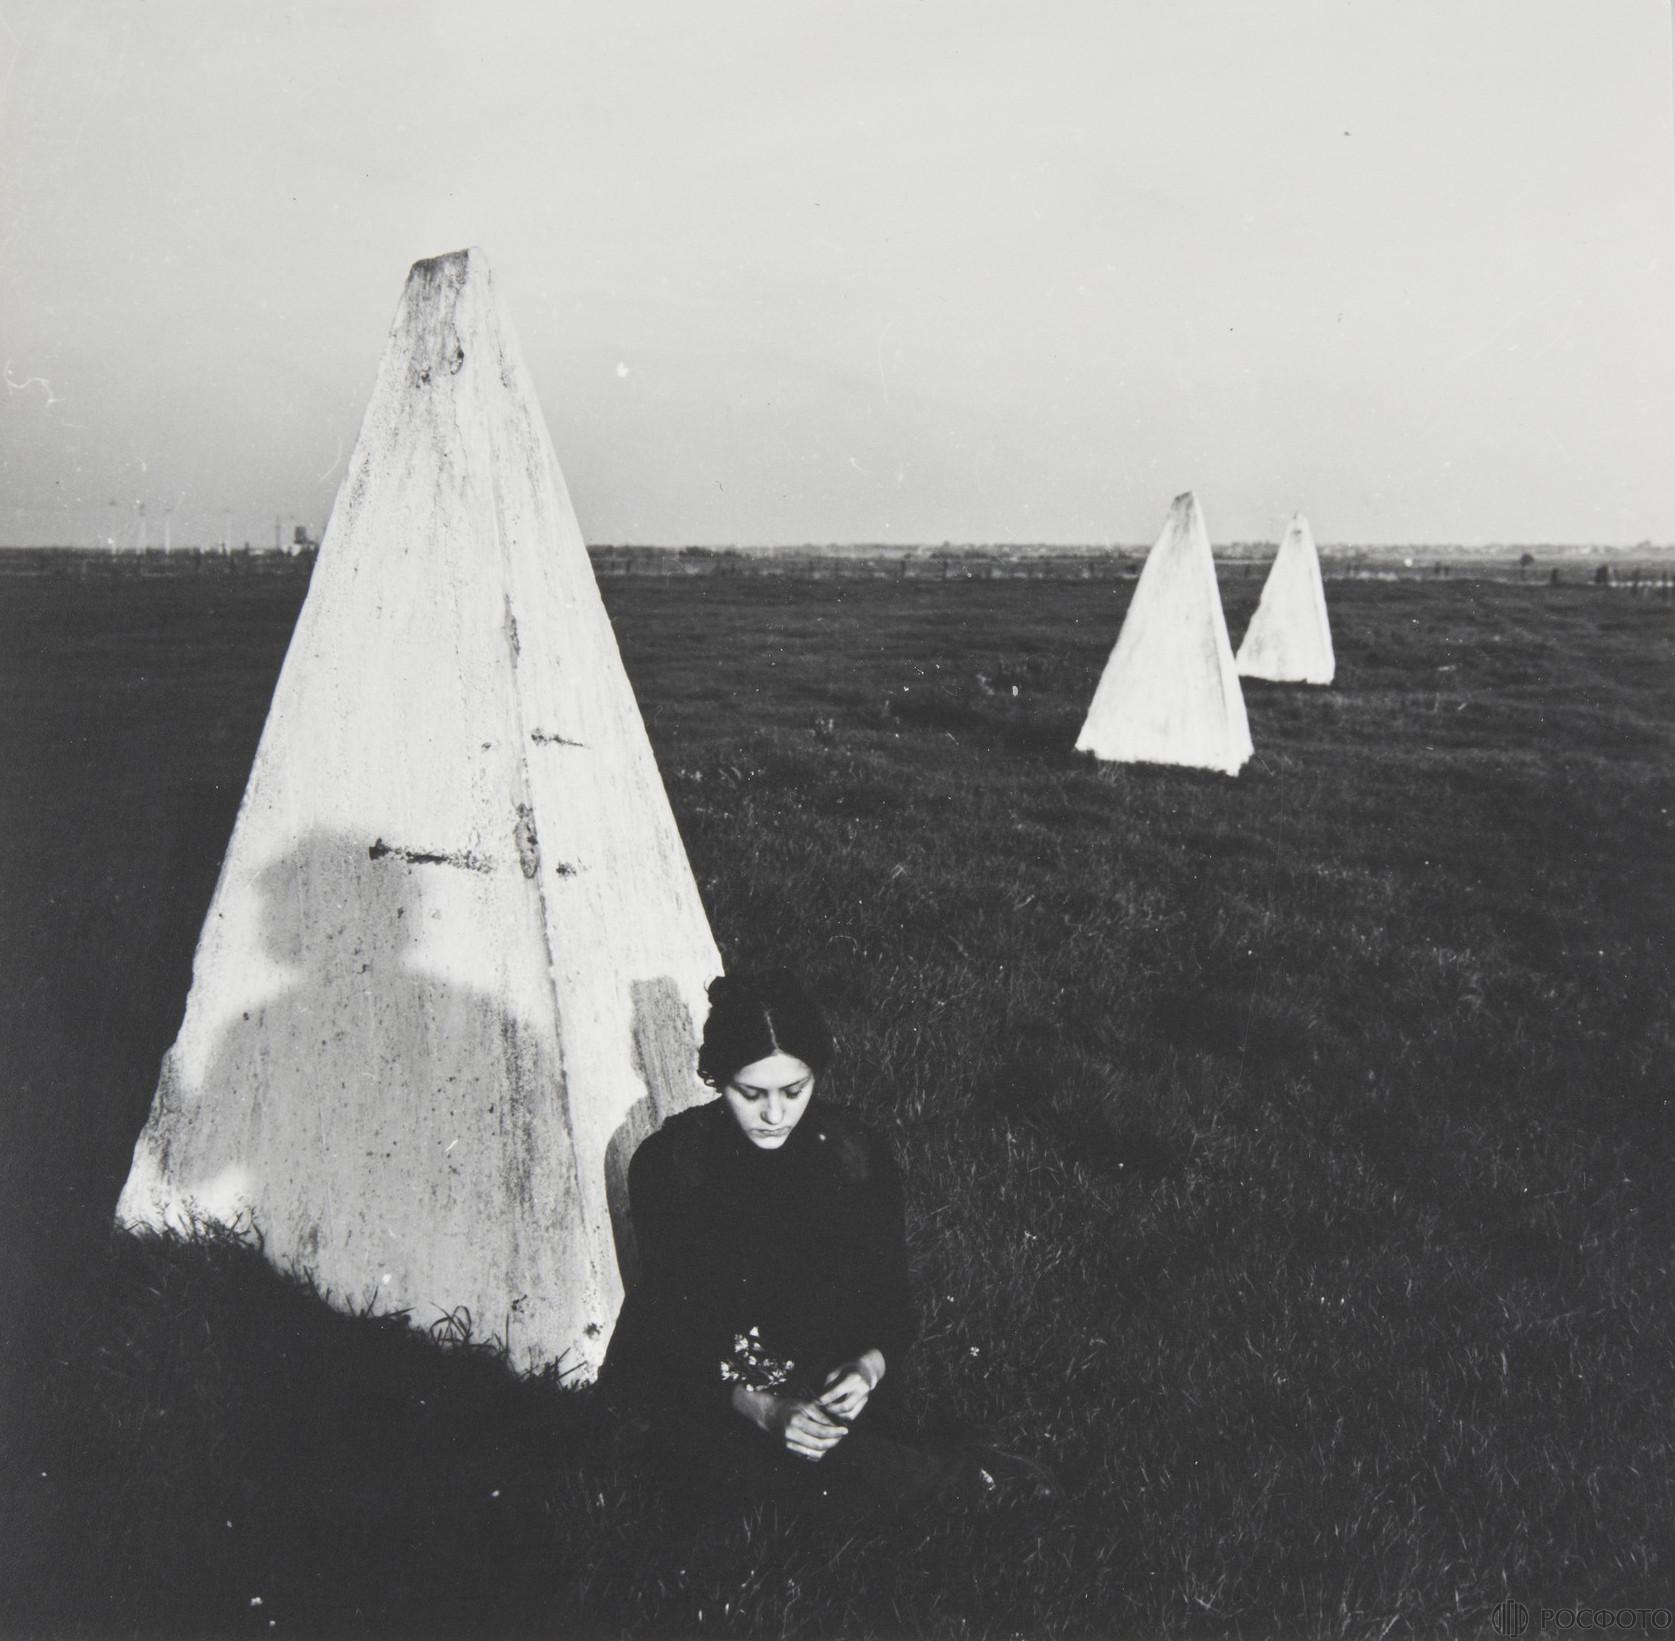 1980-е. Девушка у ж/б пирамиды